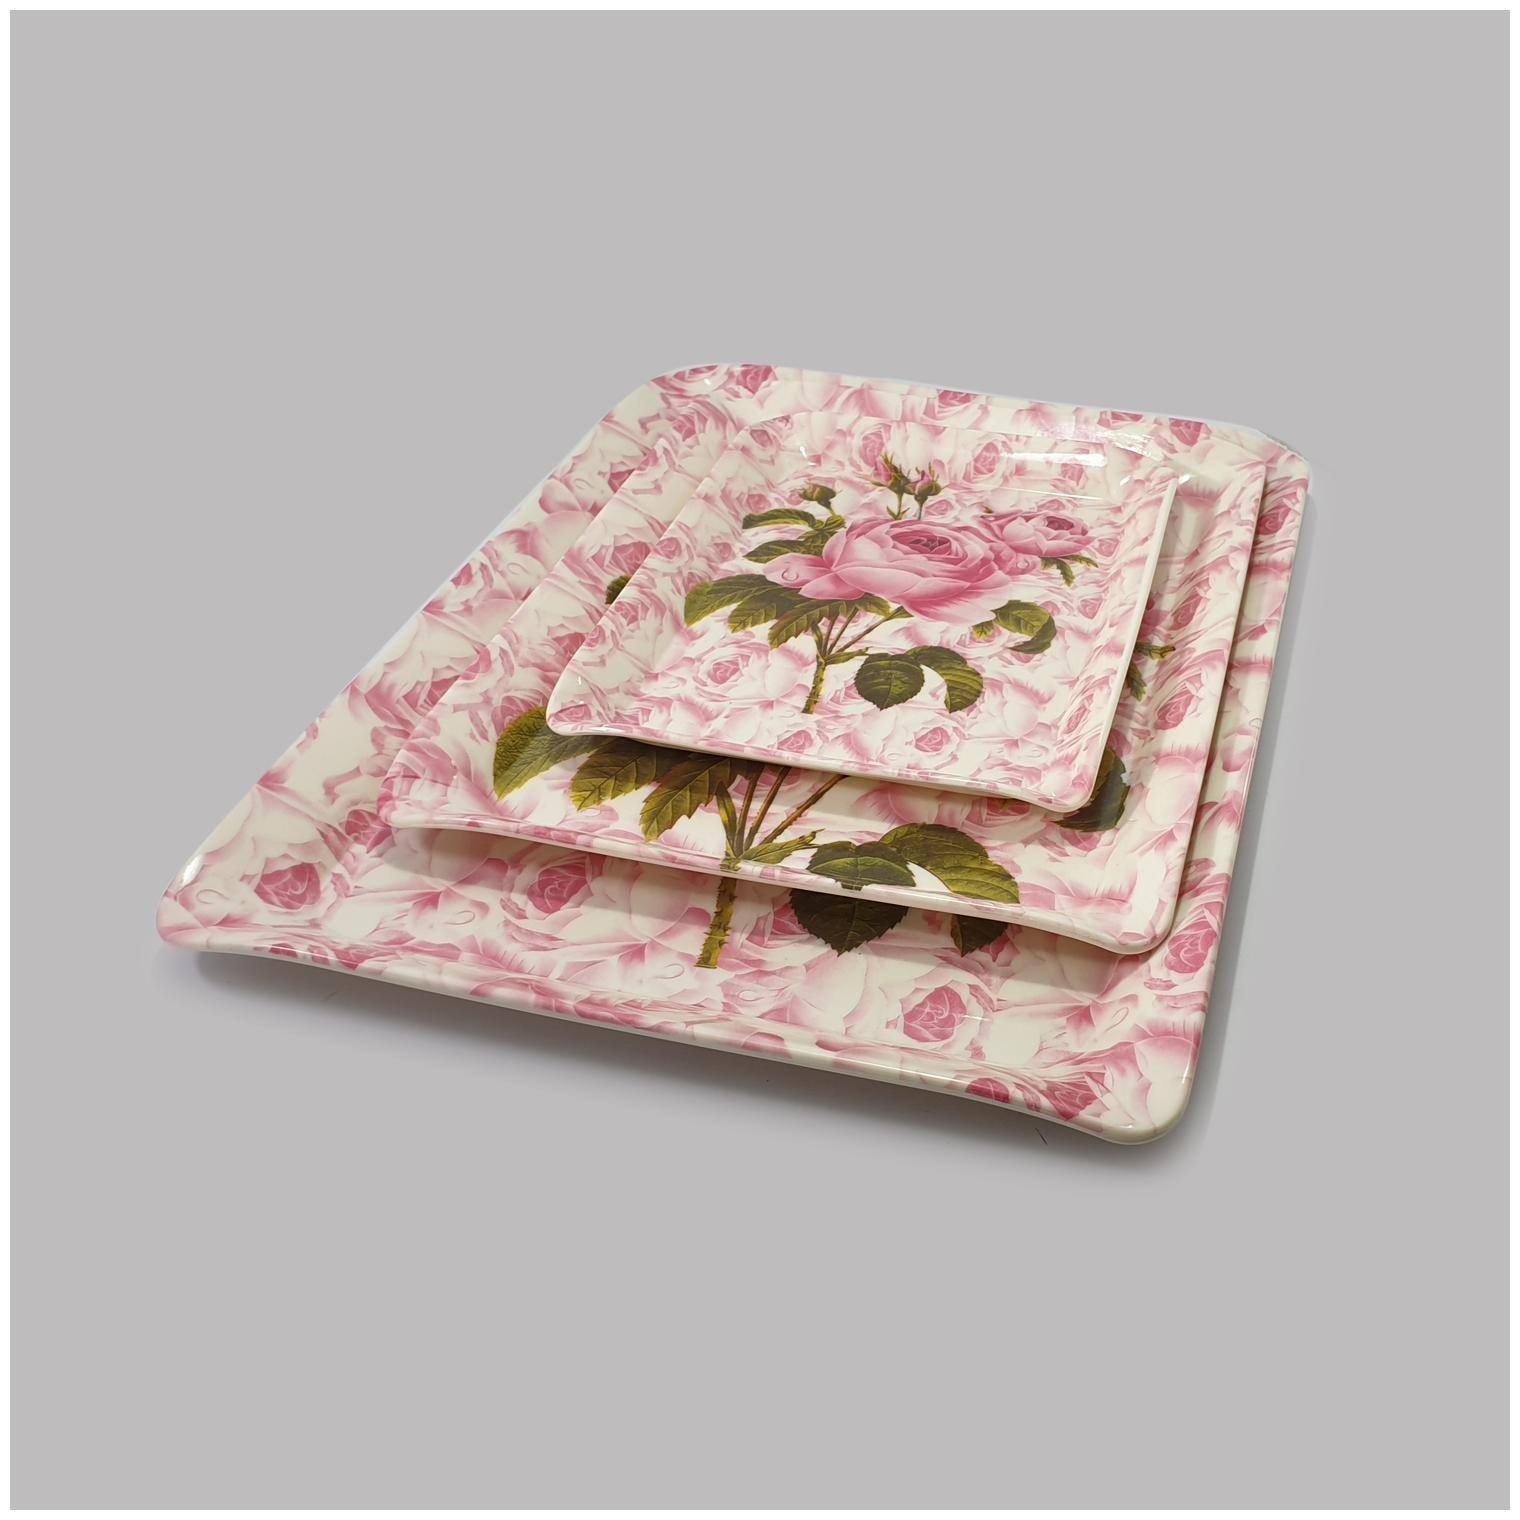 Gallery99 Ferrari Pink Rose High Grade Melamine Serving Trays - Set of...